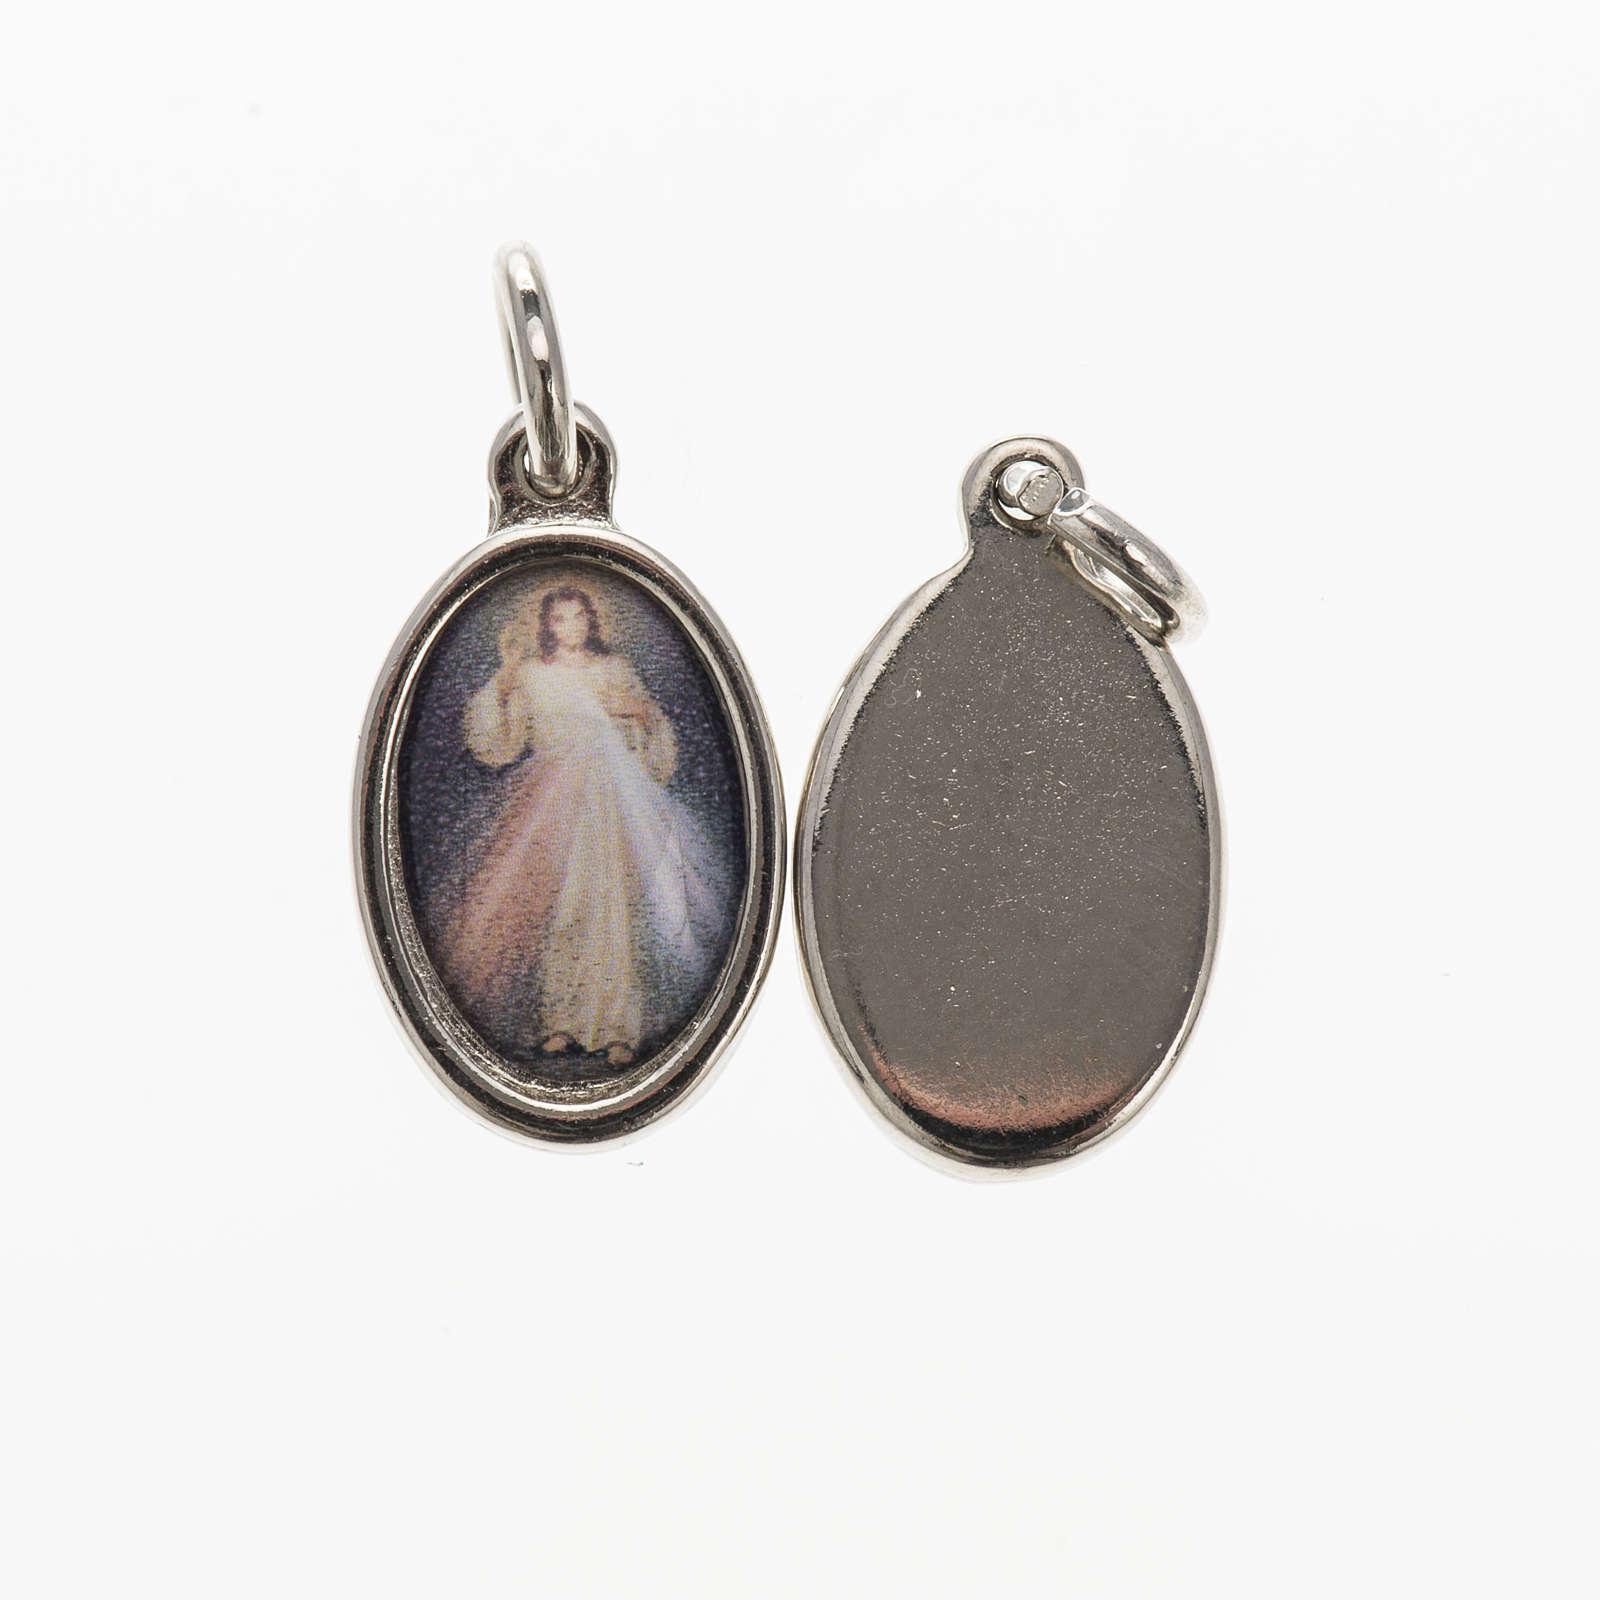 Medalla Jesús Misericordioso metal niquelado resina 1,5x1 4